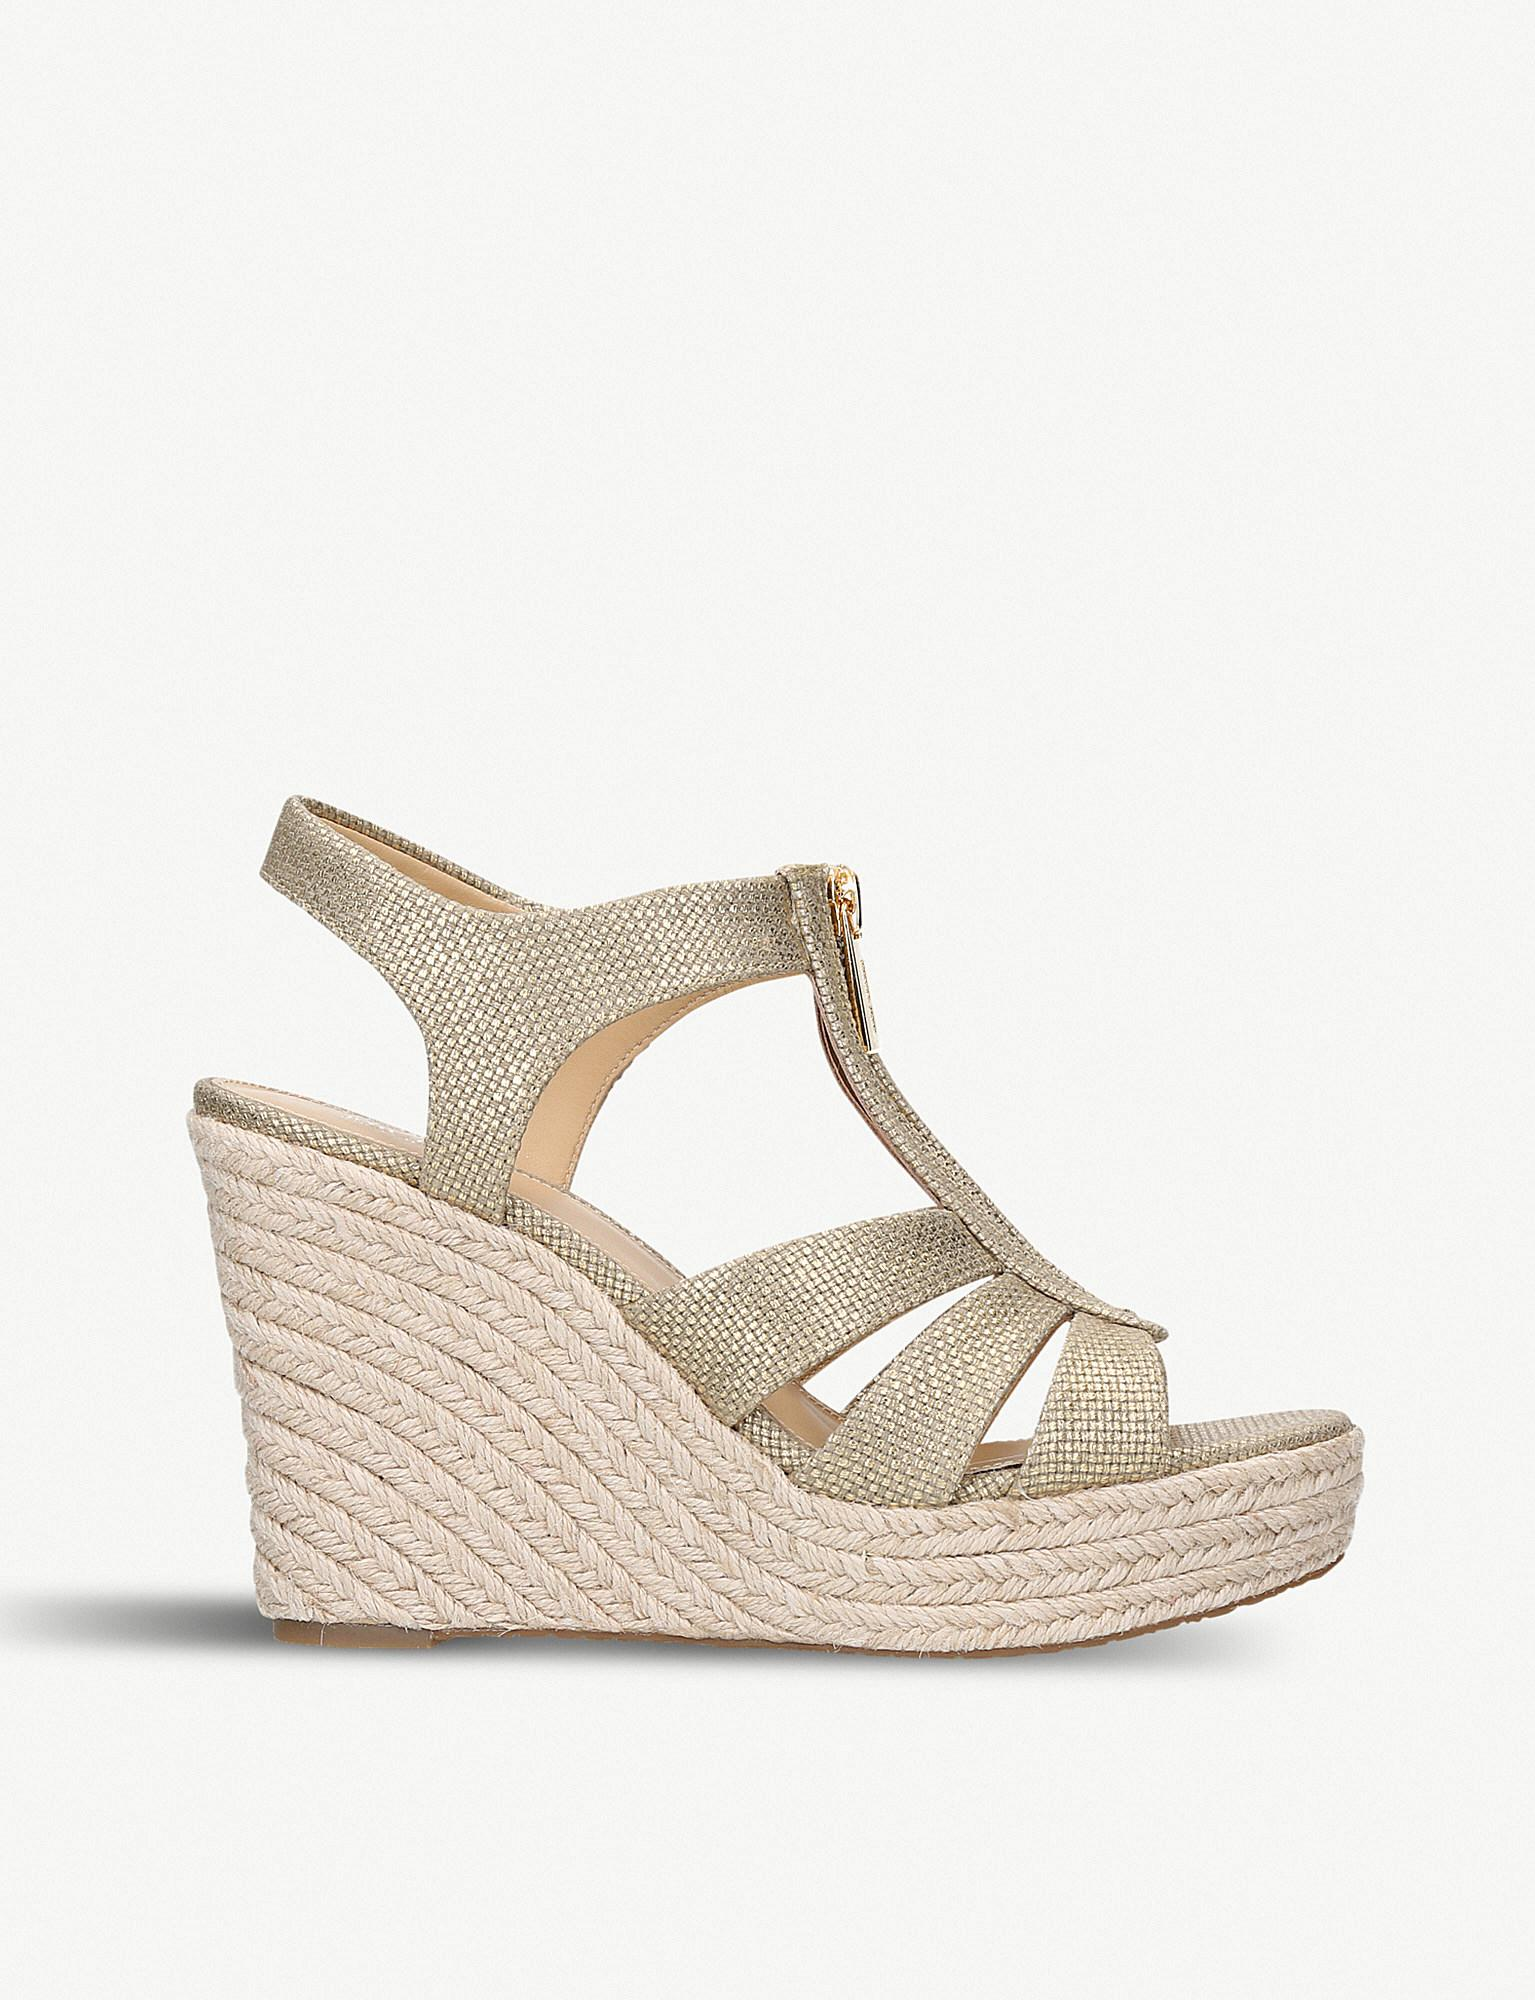 3ae4d9077064 Lyst - MICHAEL Michael Kors Berkley Jute-wedge Sandals in Metallic